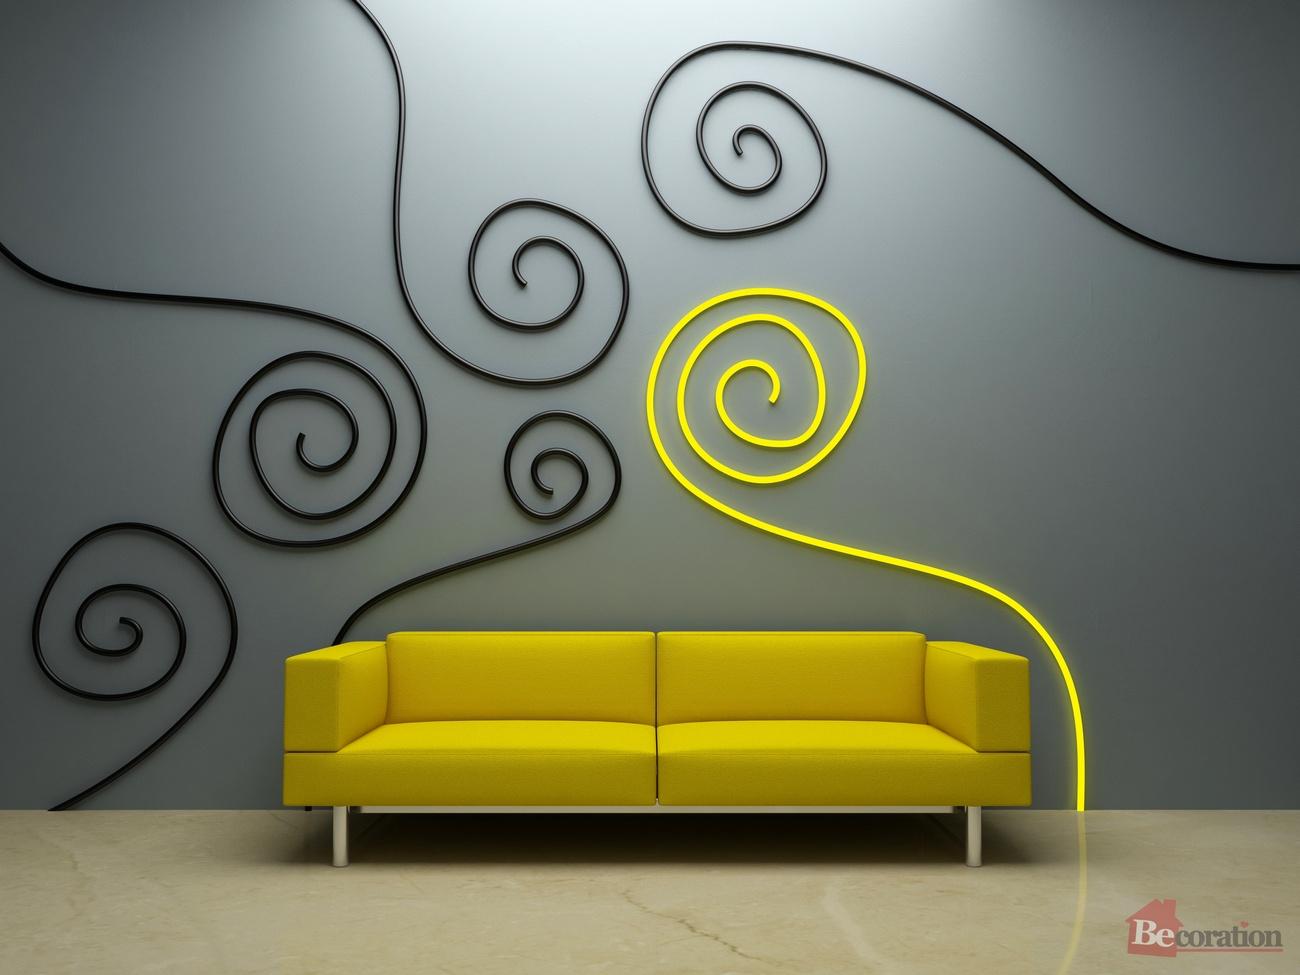 Interior design - Yellow couch and decor